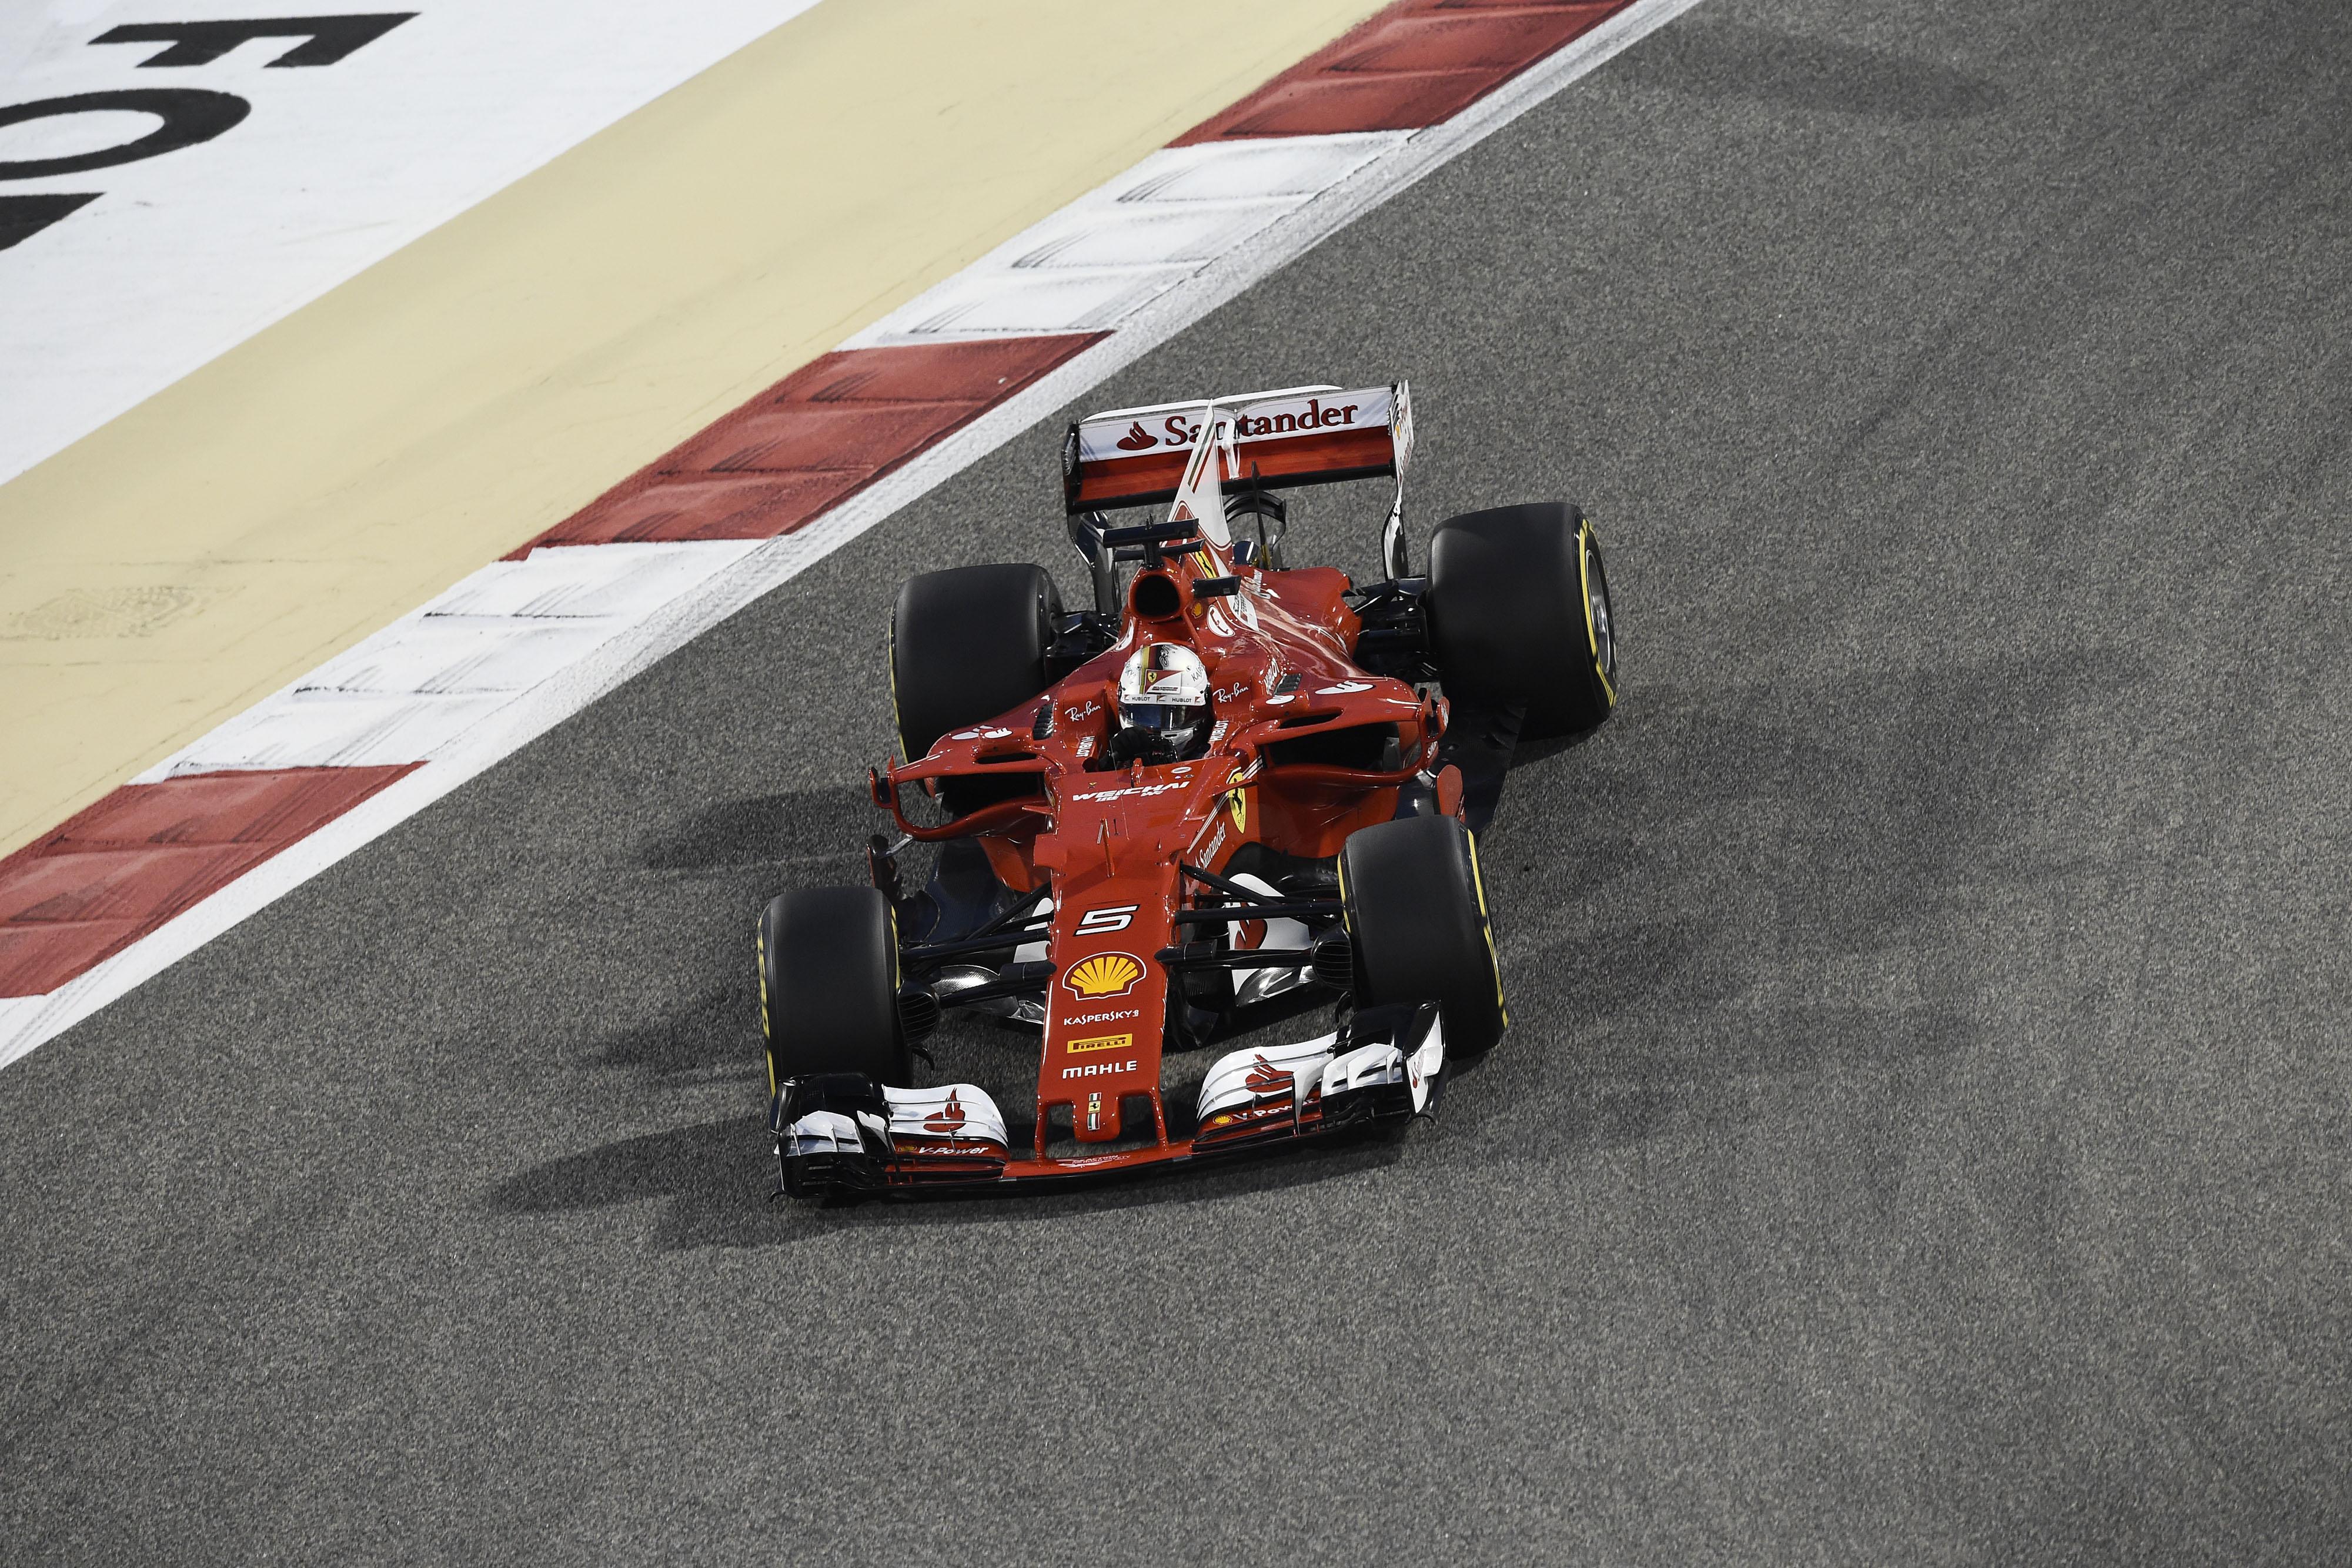 bahrain grand prix 2017